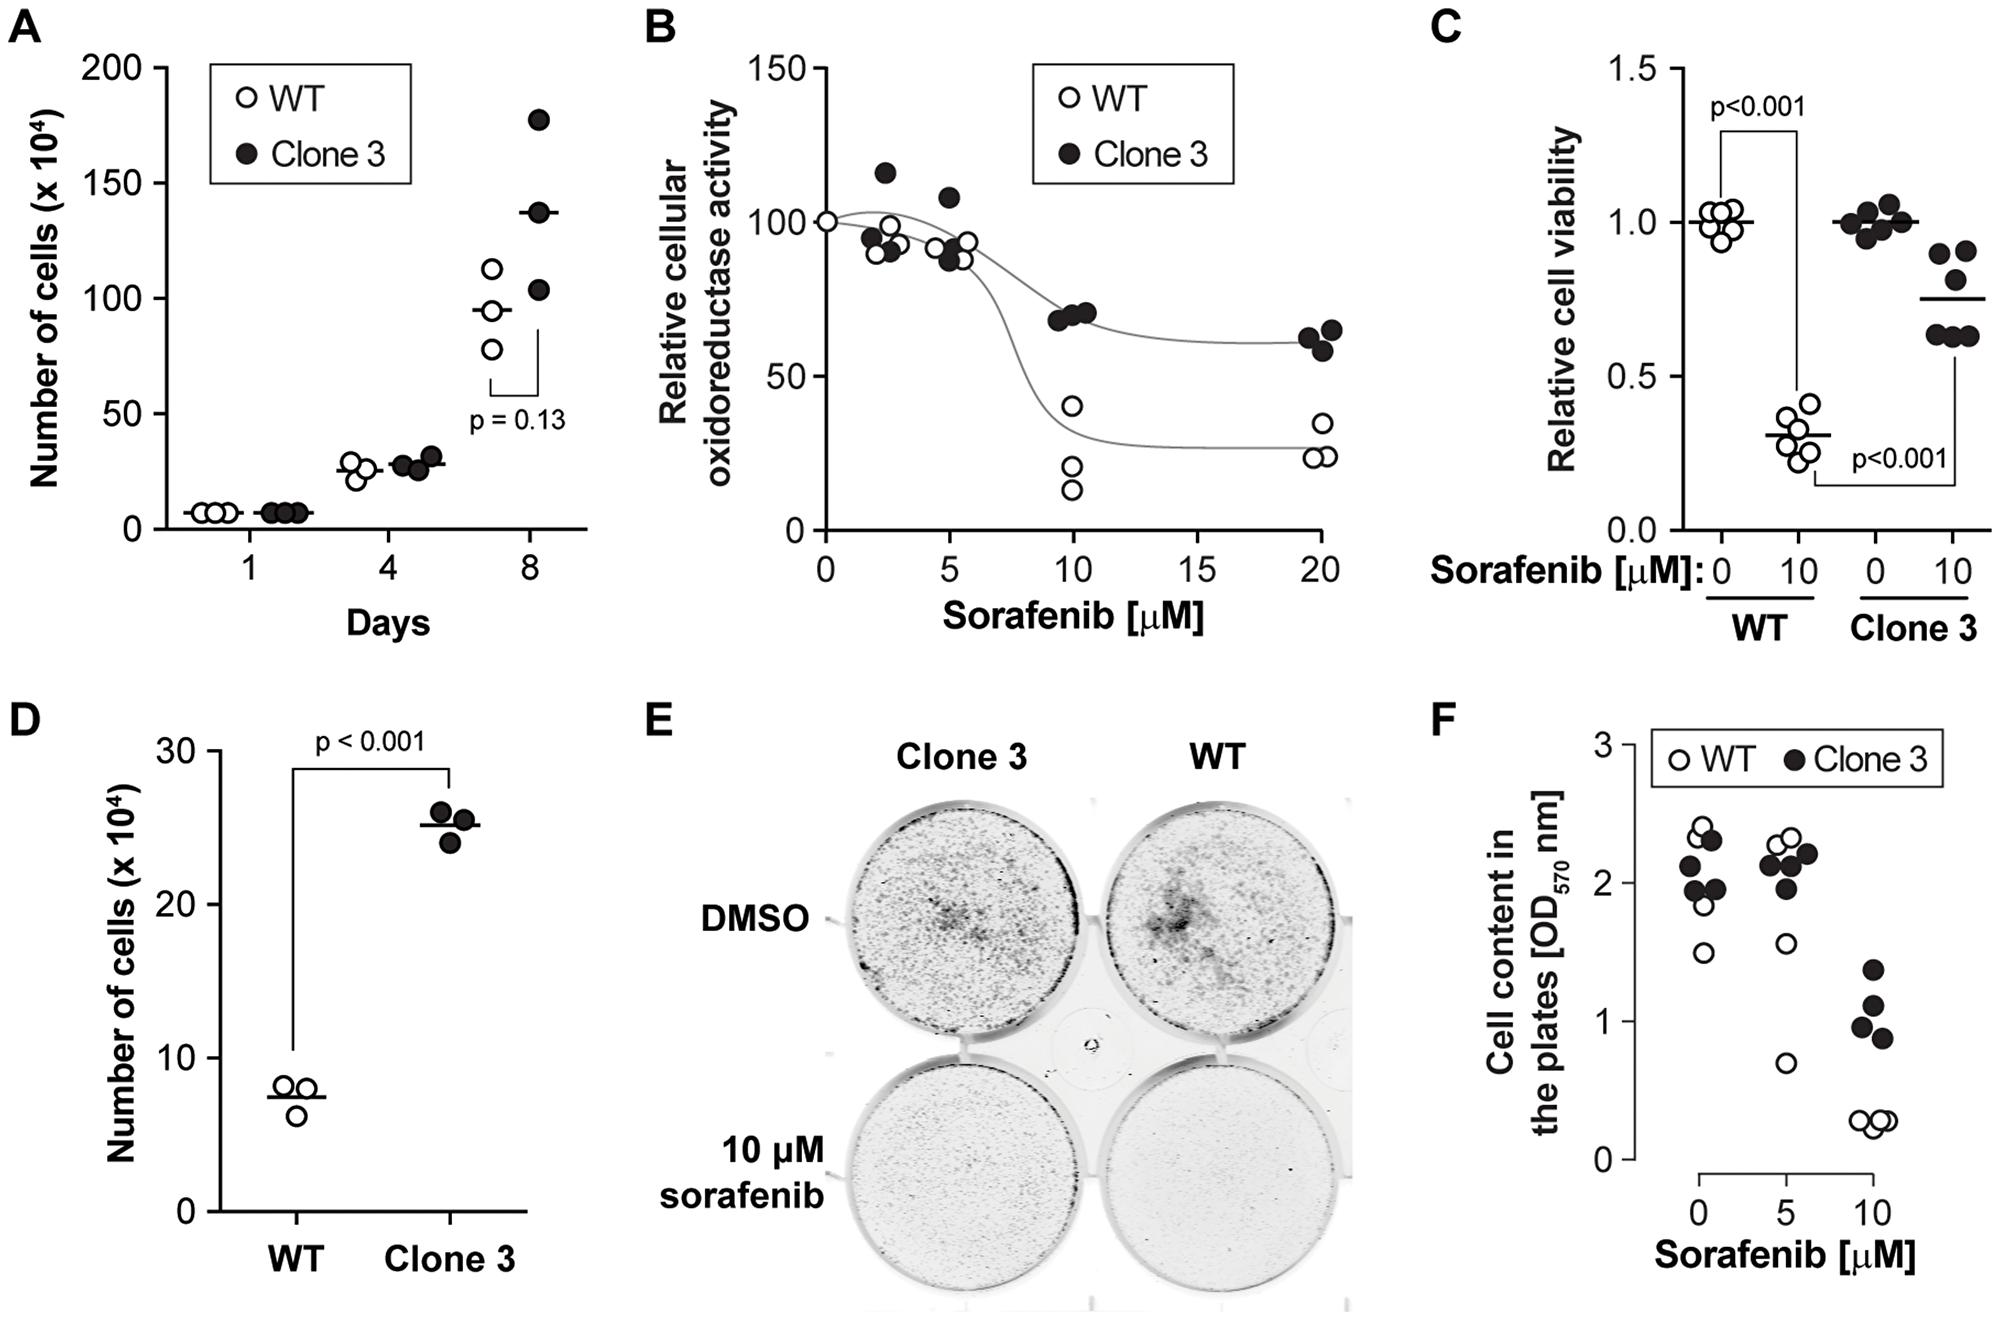 KEAP1 disruption decreases the sensitivity to sorafenib.